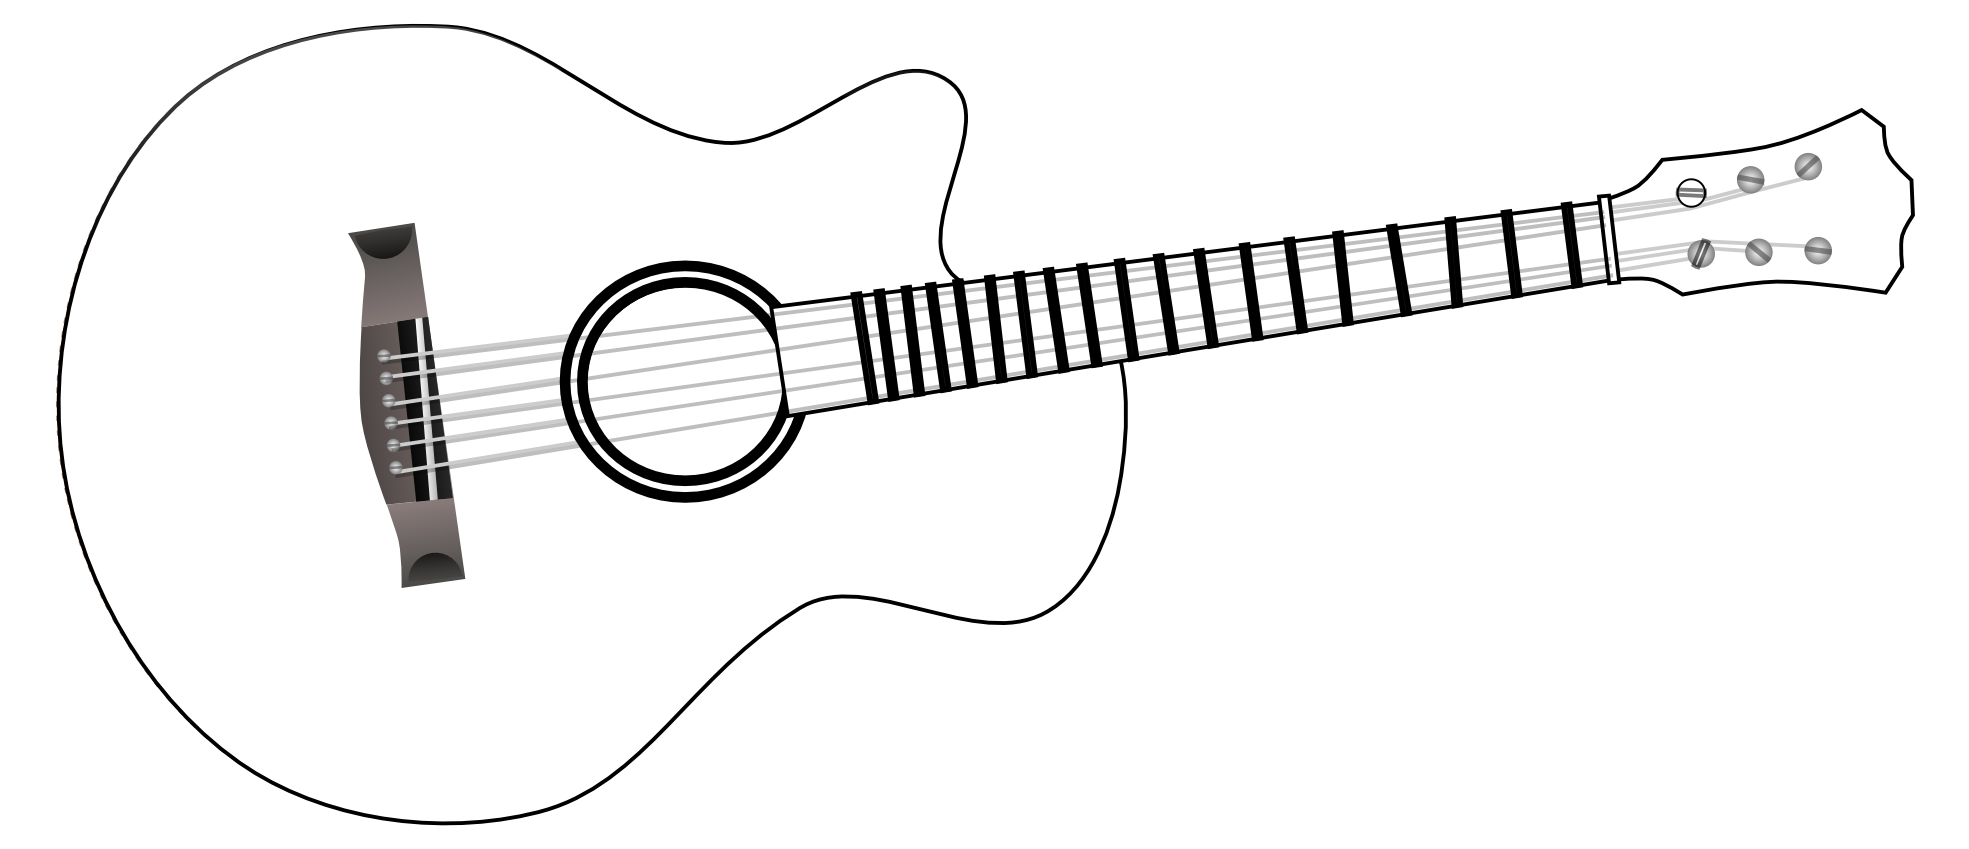 Festival clipart guitar art Guitar black And white clipart